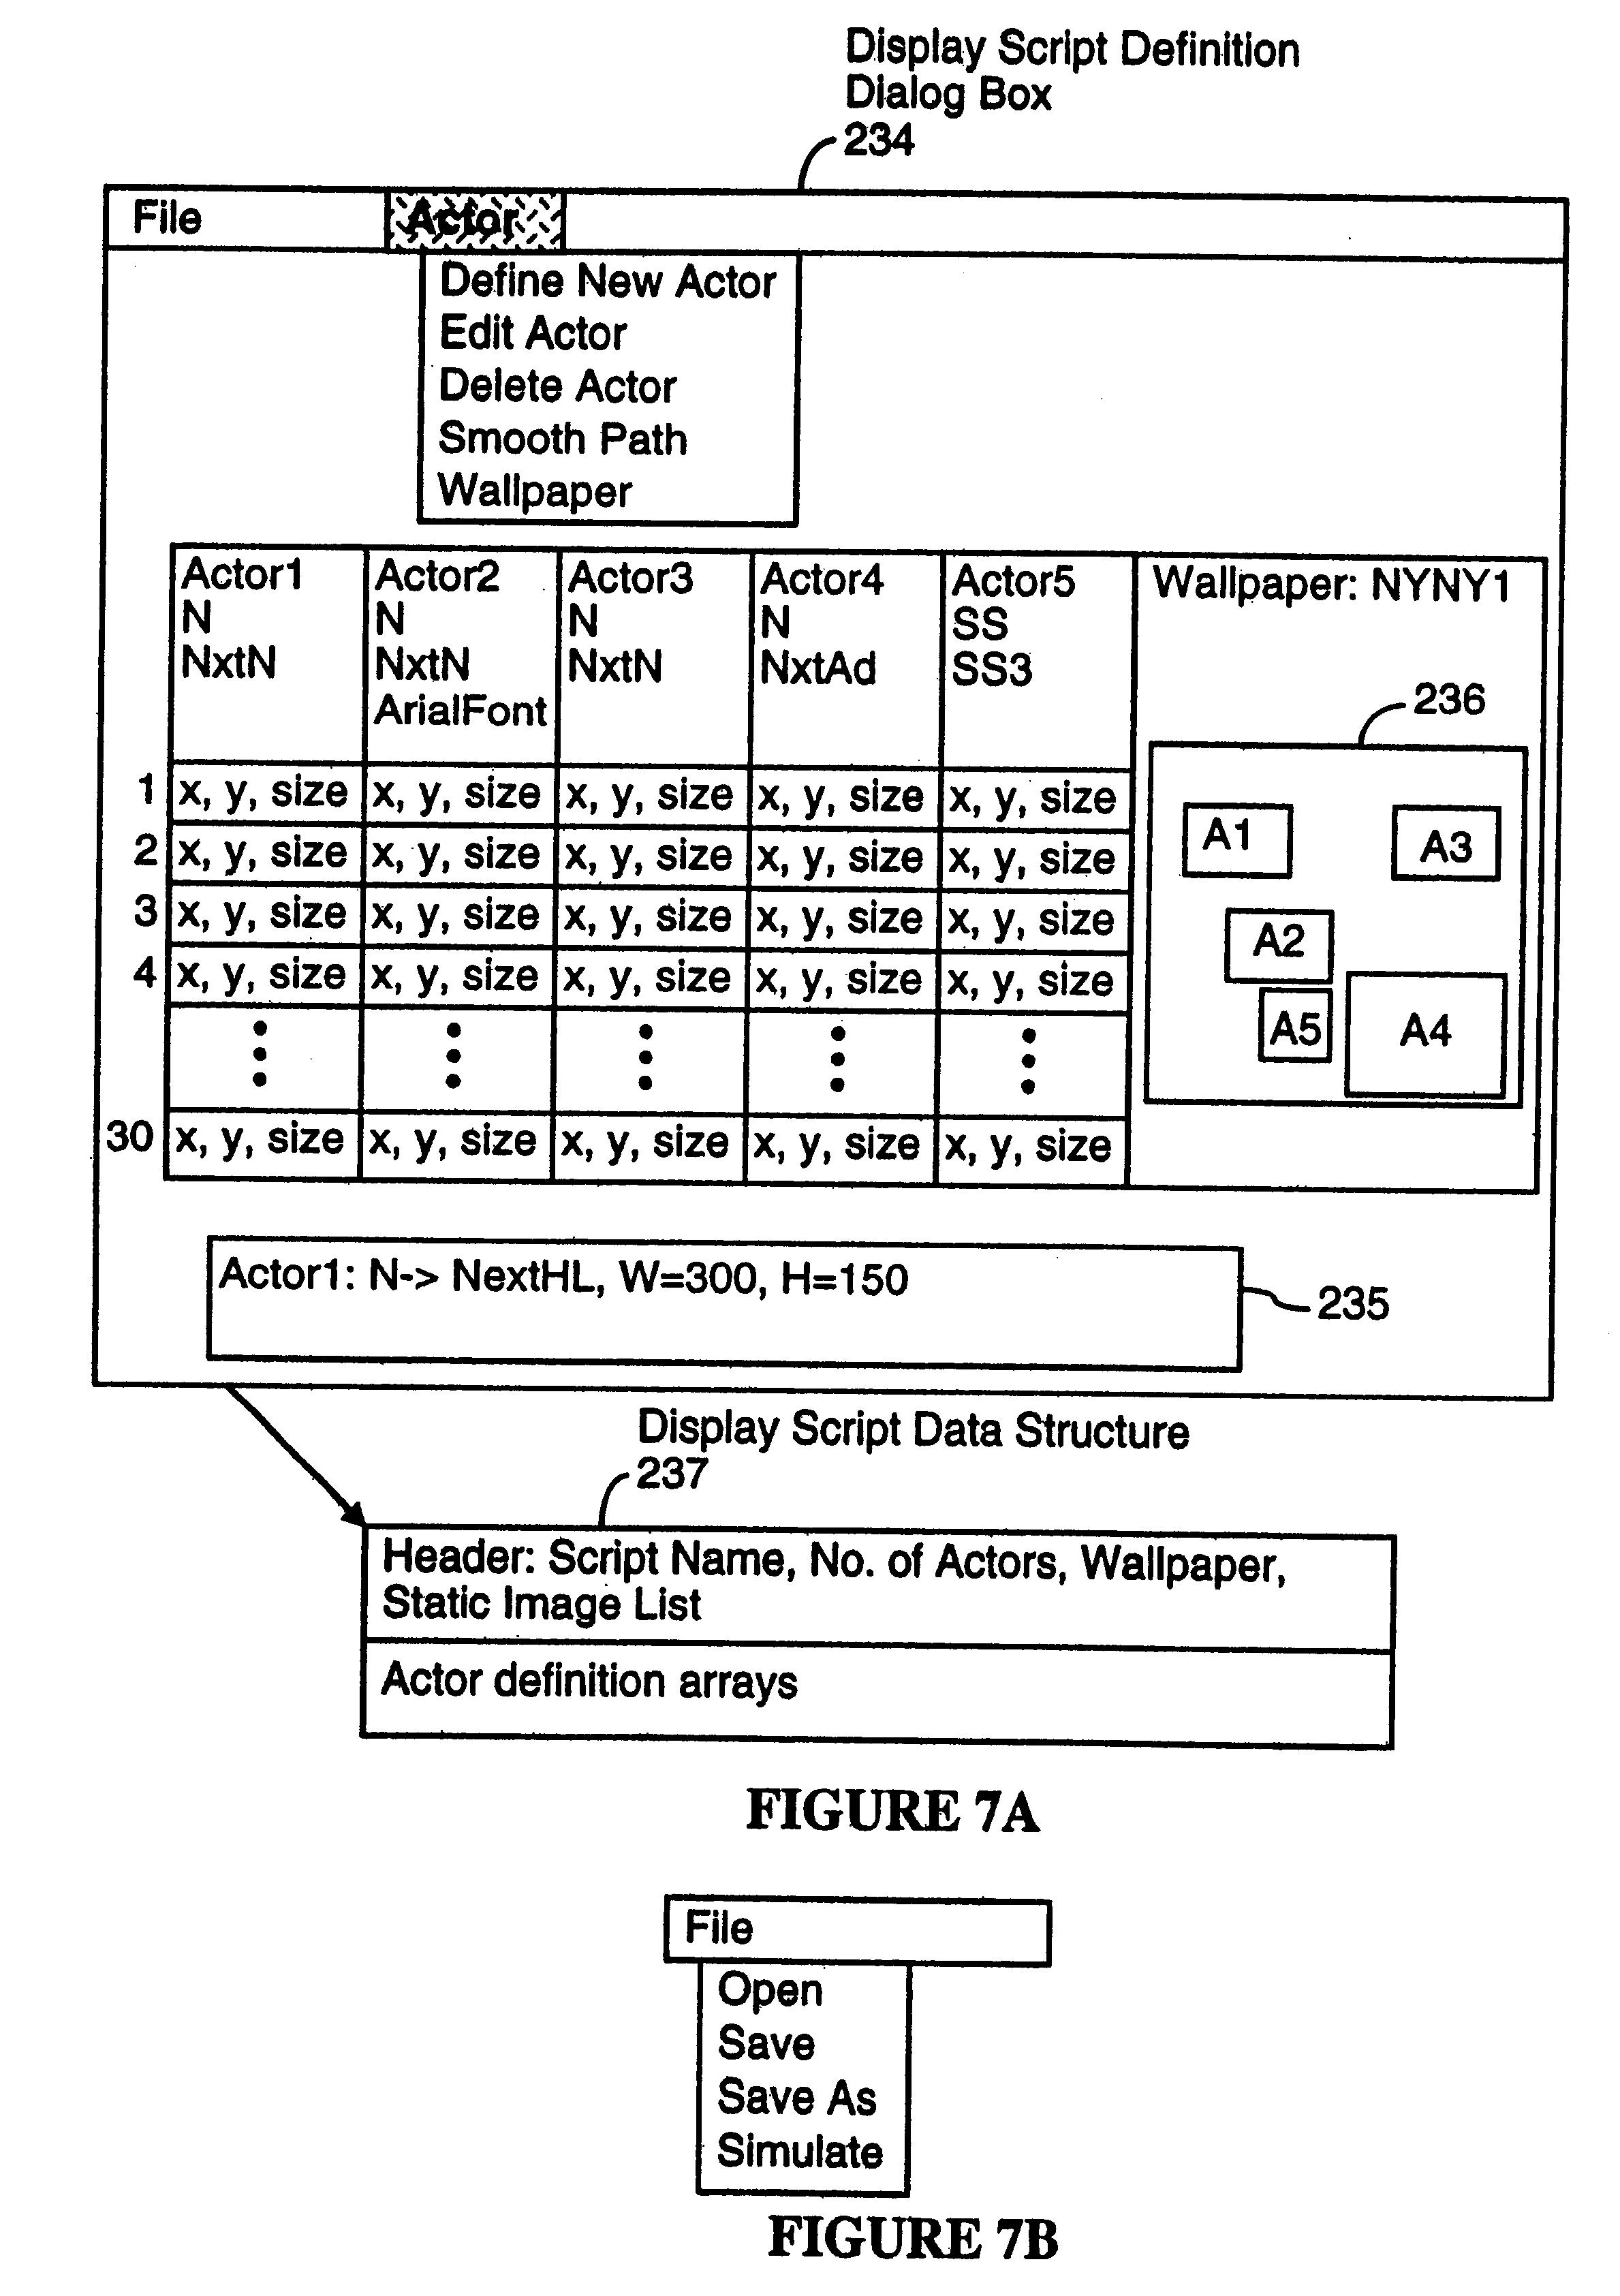 Patent US 6,807,558 B1